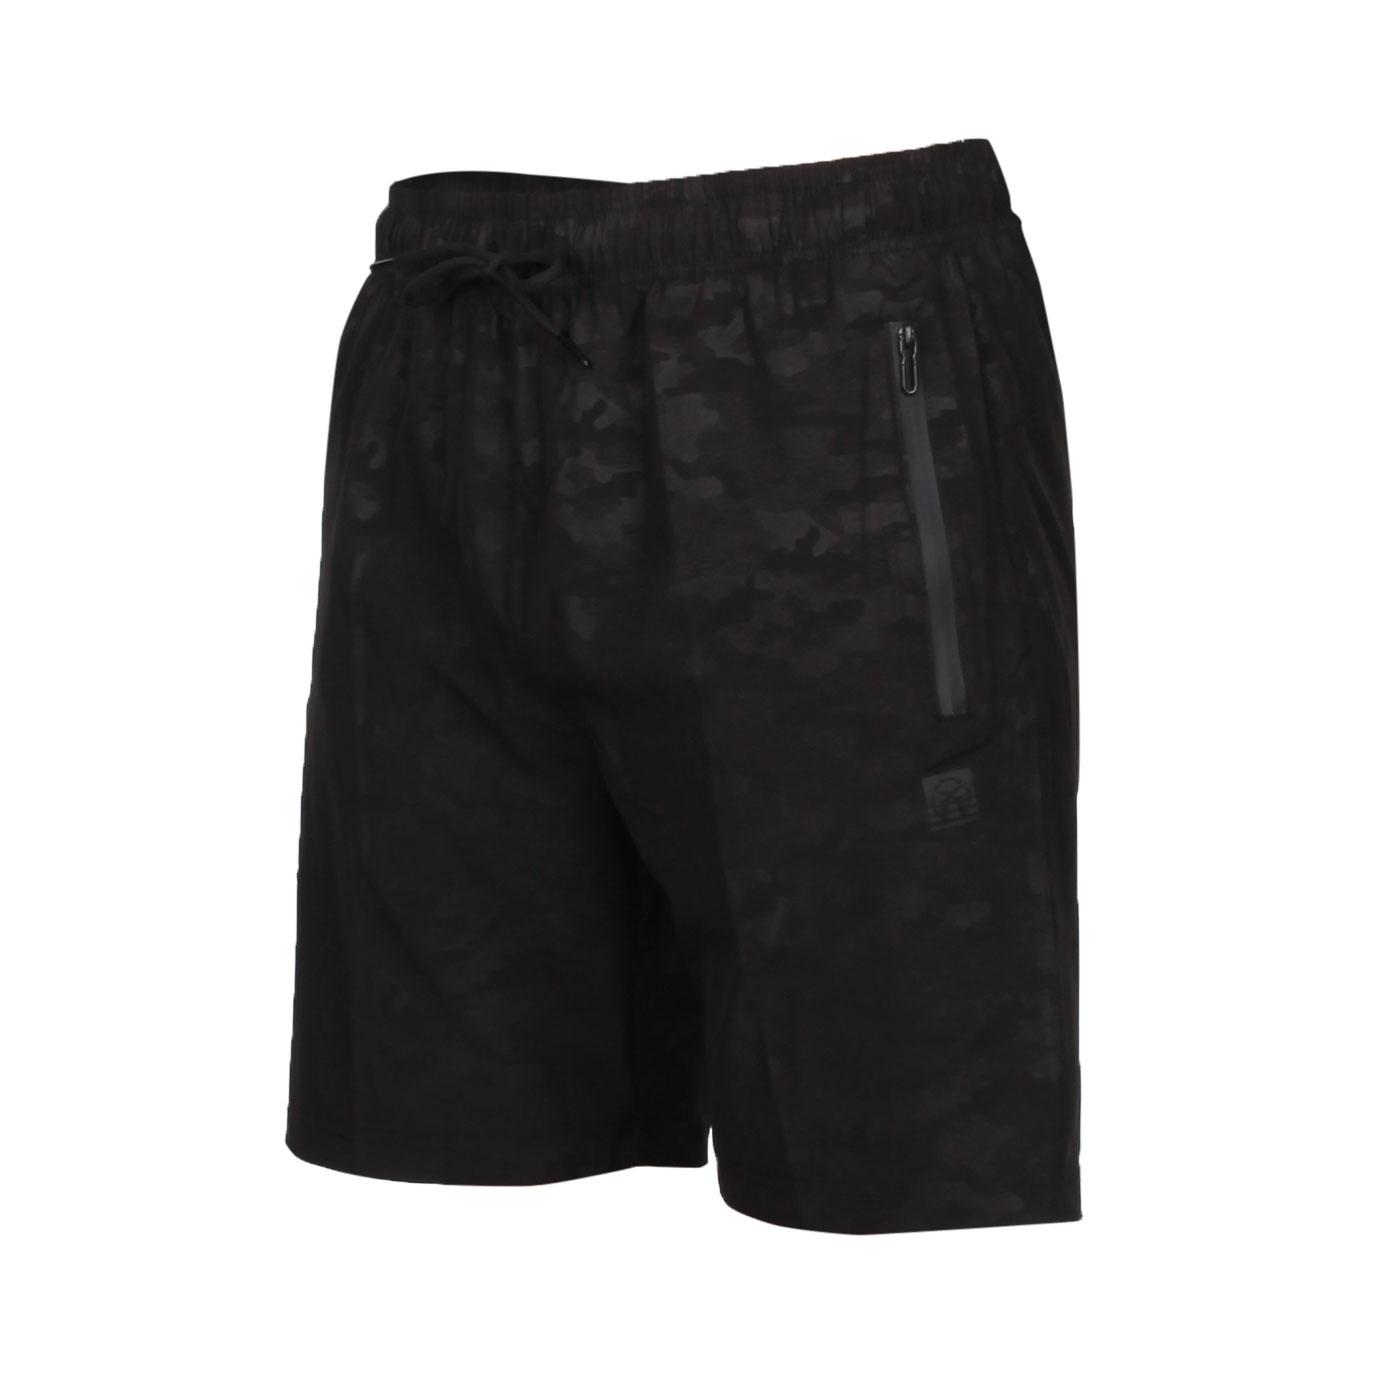 FIRESTAR 男款彈性平織短褲 C0518-10